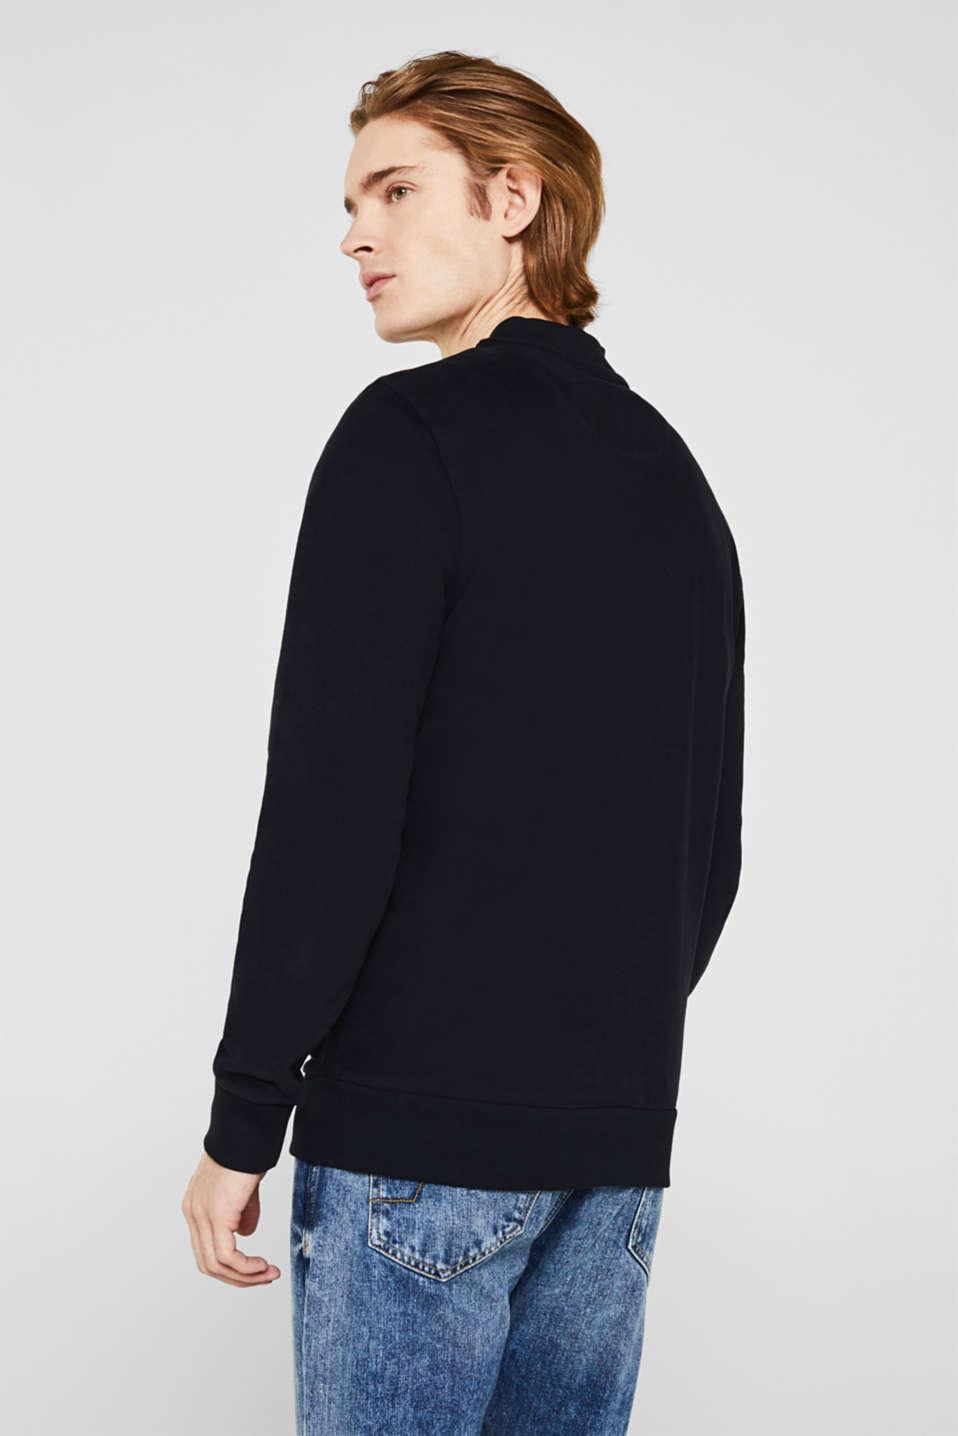 Bomber-style sweatshirt jacket, 100% cotton, BLACK, detail image number 3